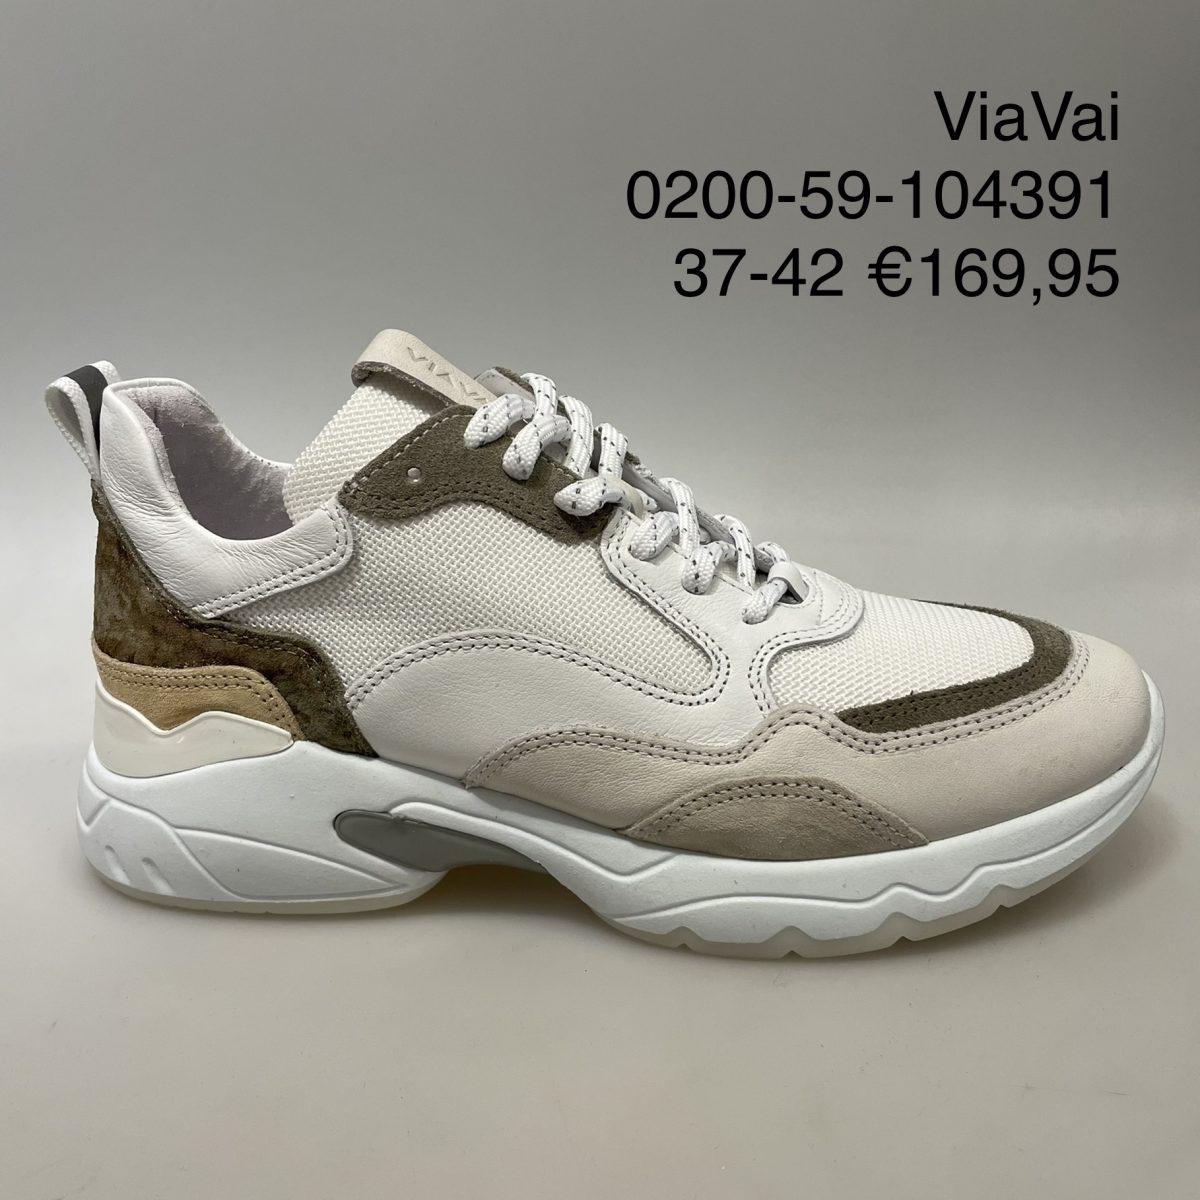 Dames Schoenen 1